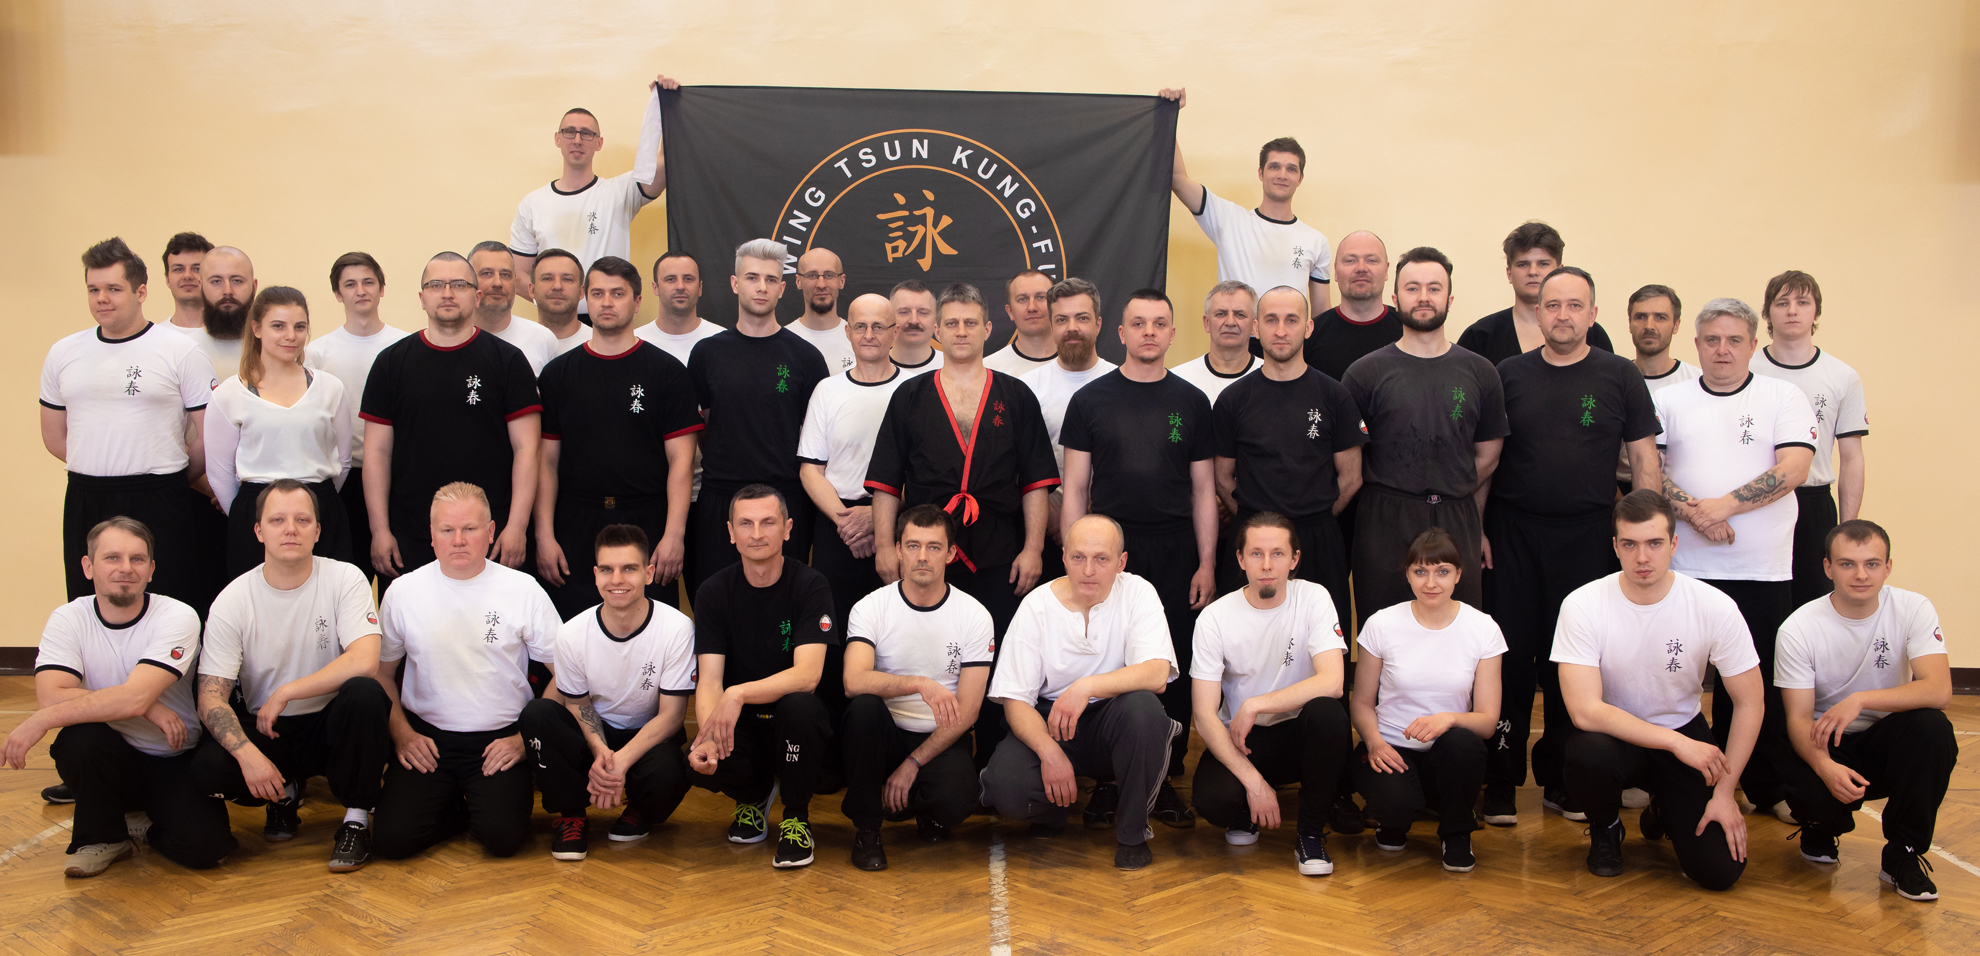 Seminarium Katowice 11-12.05.2019 (2)